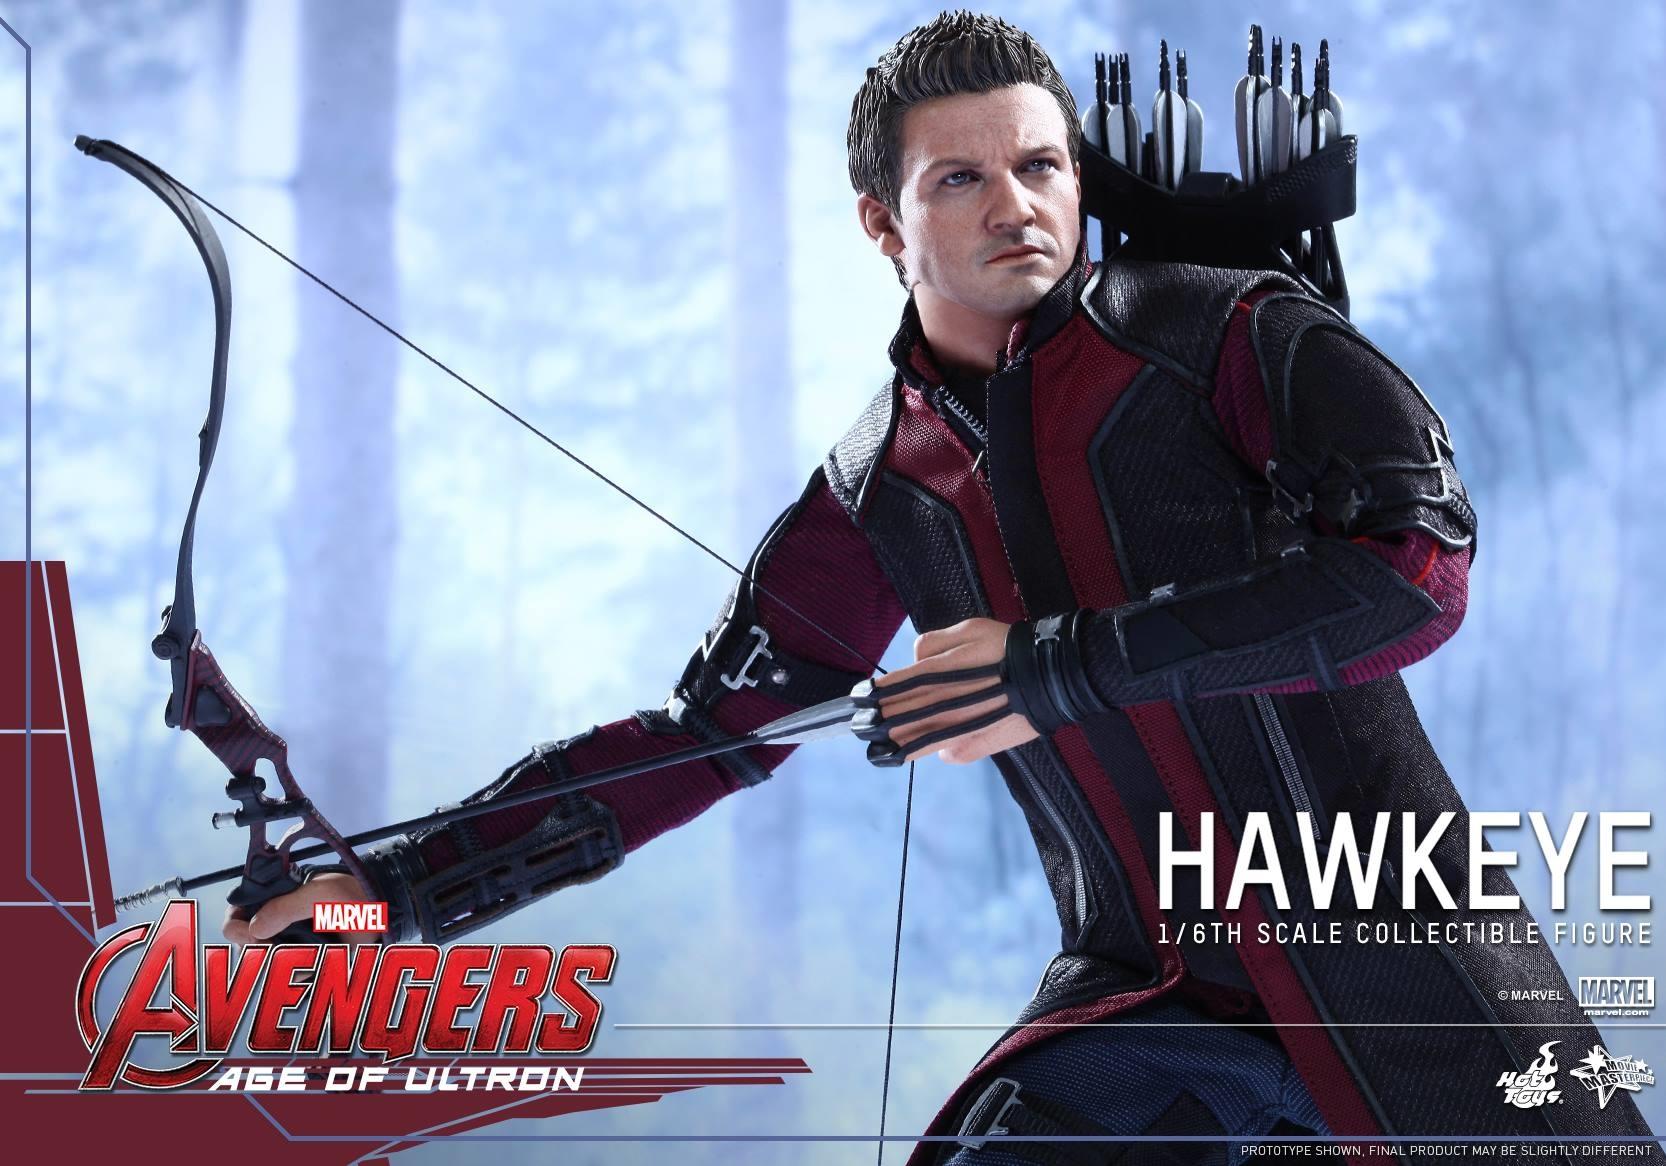 hawkeye marvel avengers wallpaper 1666x1166